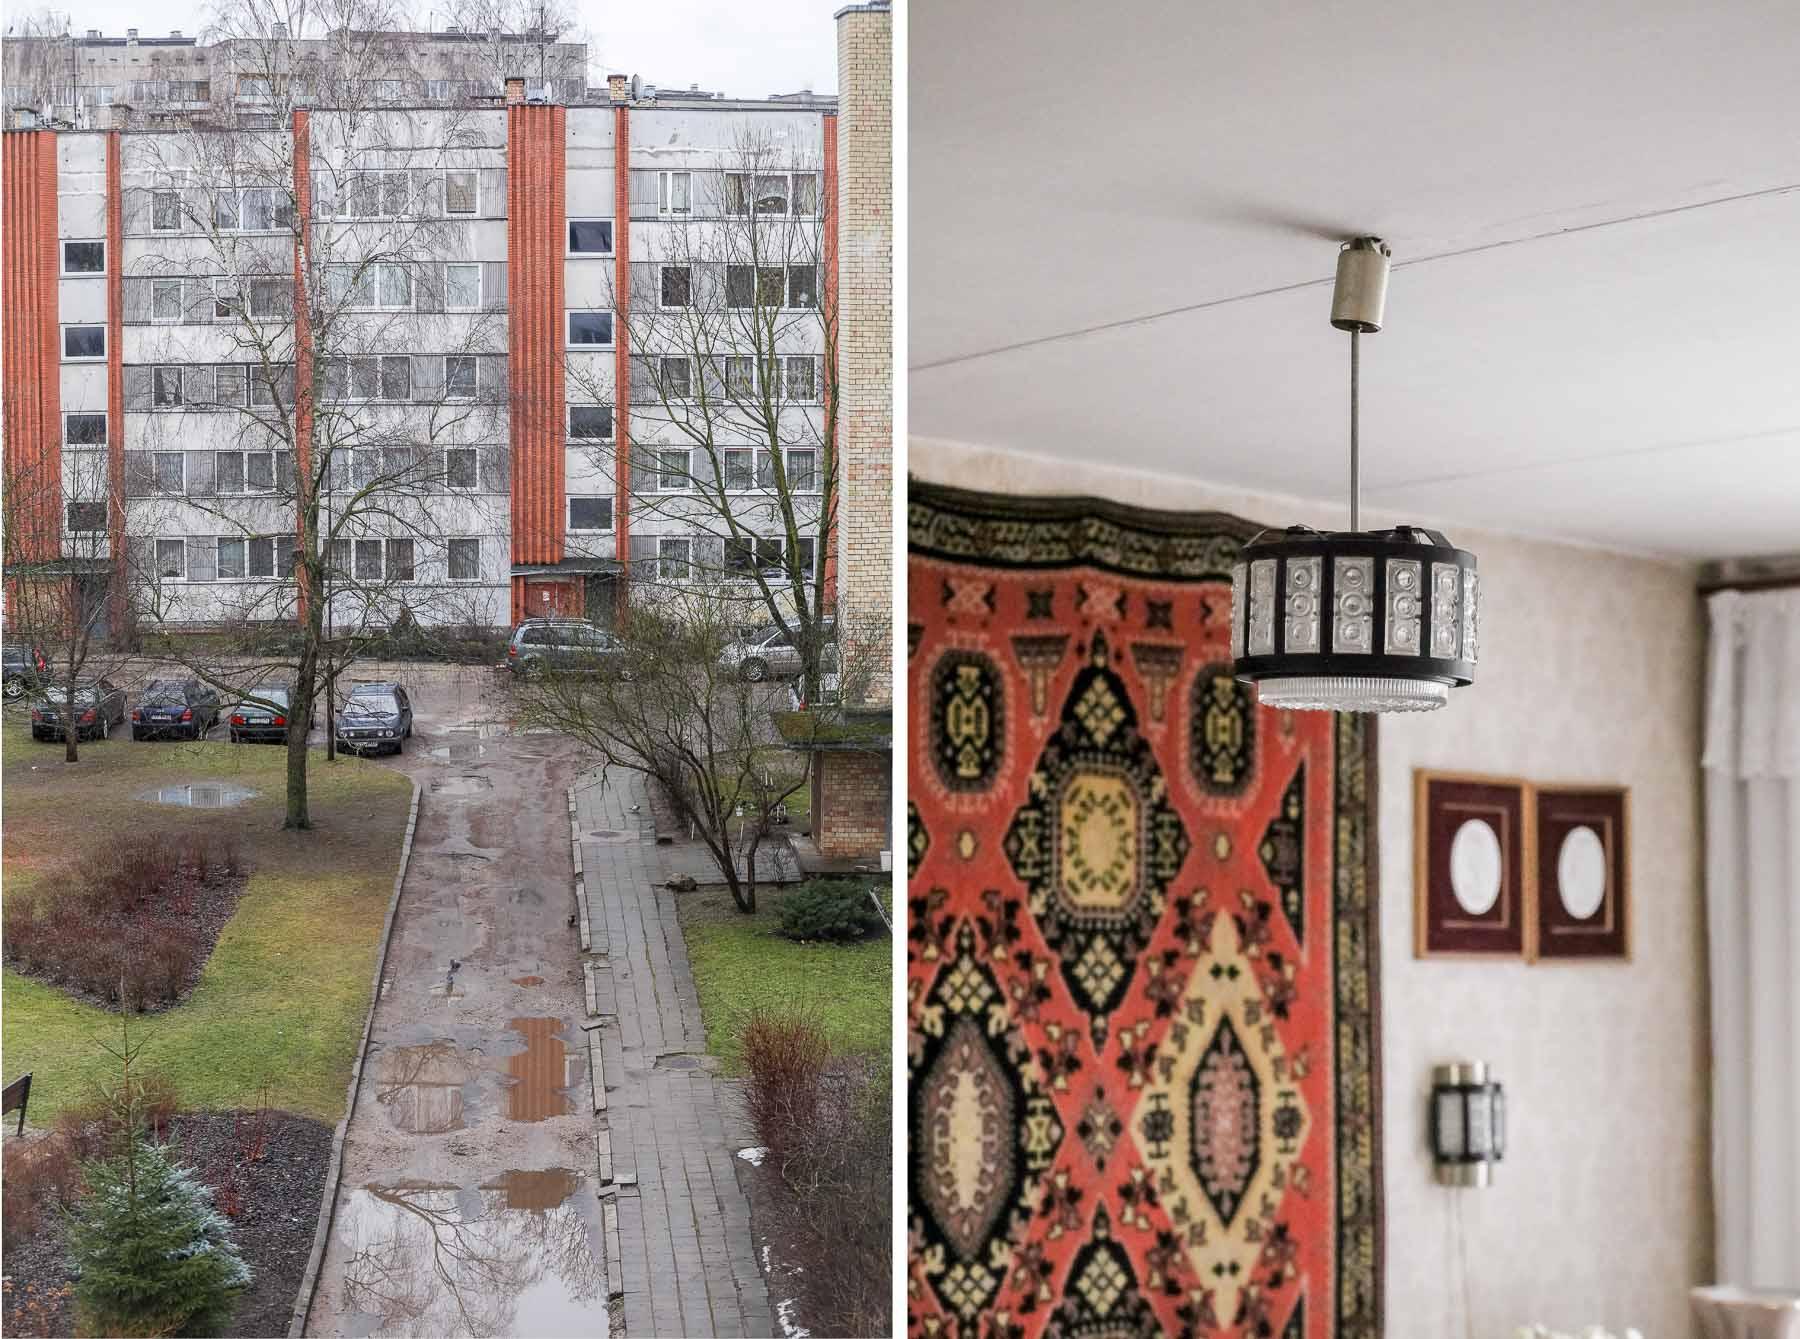 Landscape-cityscape-photography-jelgava-latvia-blocs-blocks-flat-post-soviet--Советские-квартиры-спальный-район-Латвия-город-фотограф-natalia-smith-photography-0114.jpg